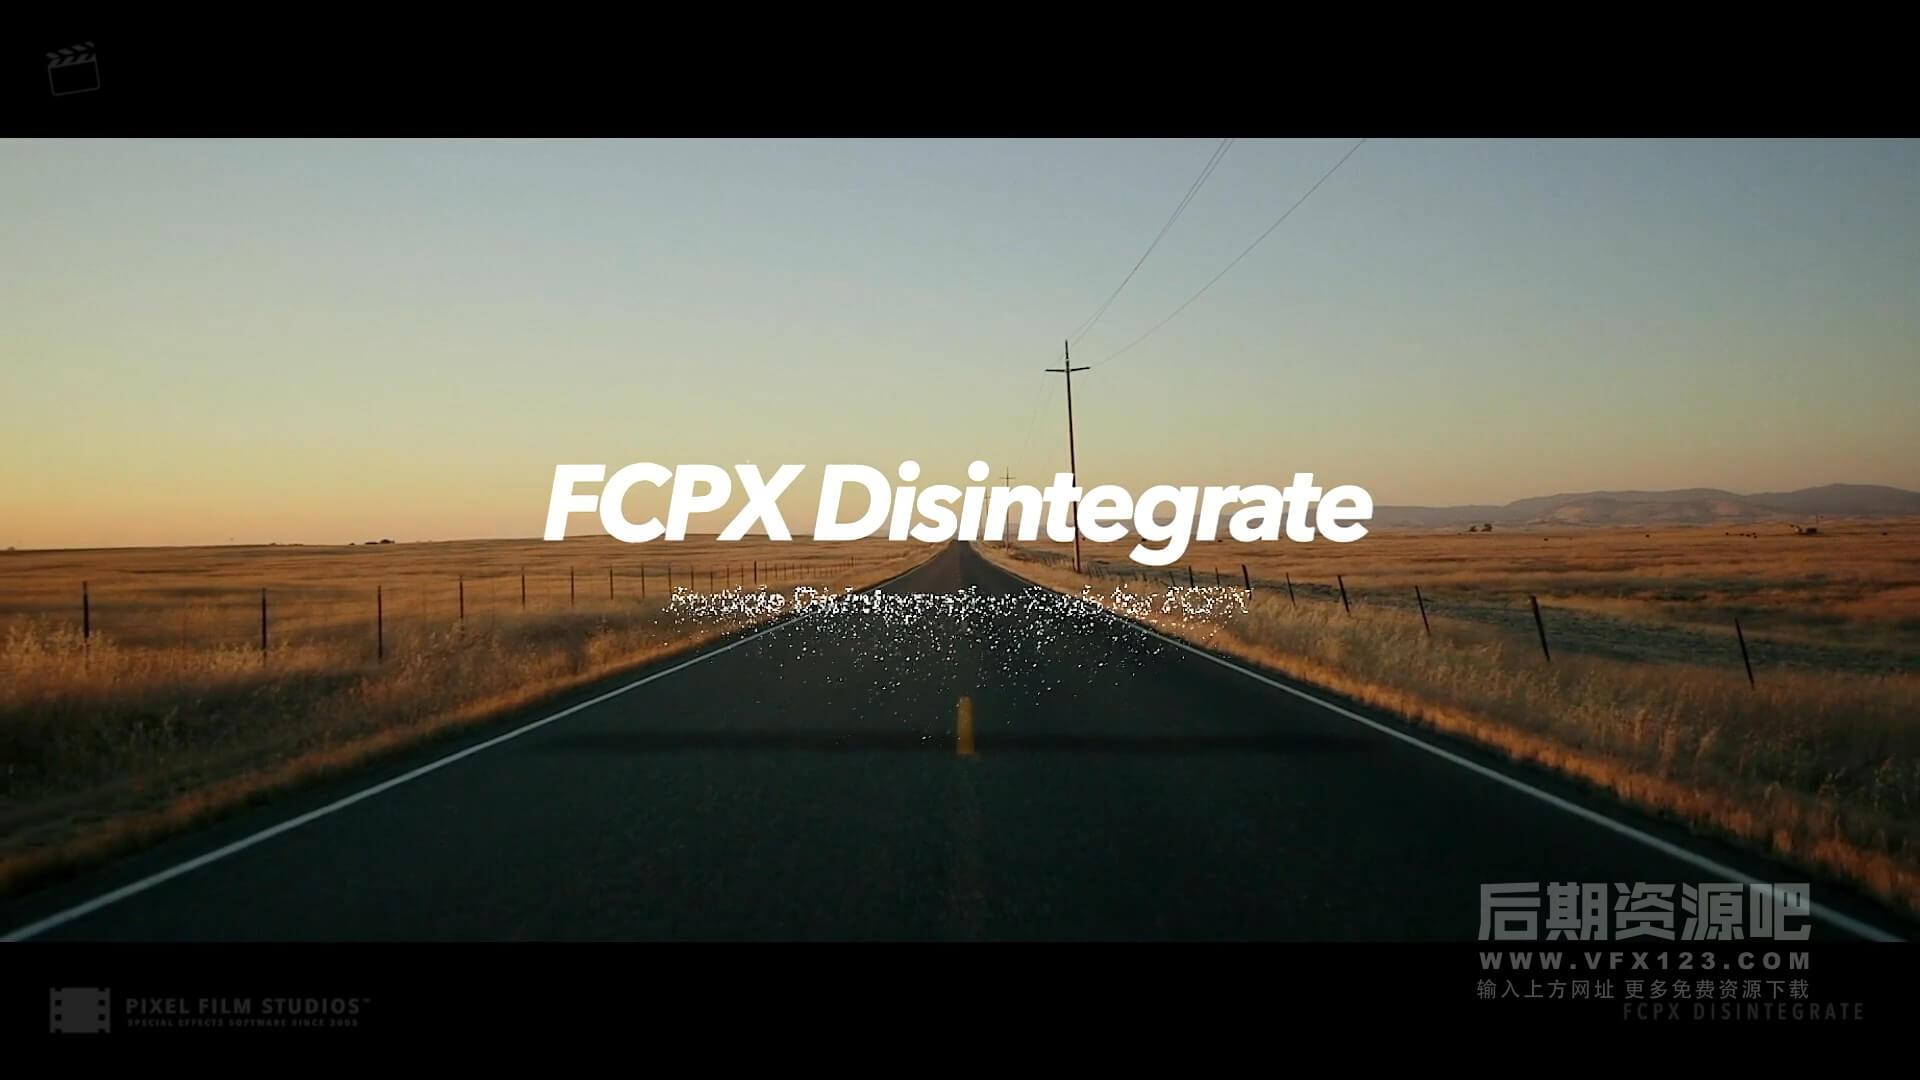 FCPX特效插件 图片文字粒子沙化消散汇聚飞散溶解 Fcpx Disintegrate